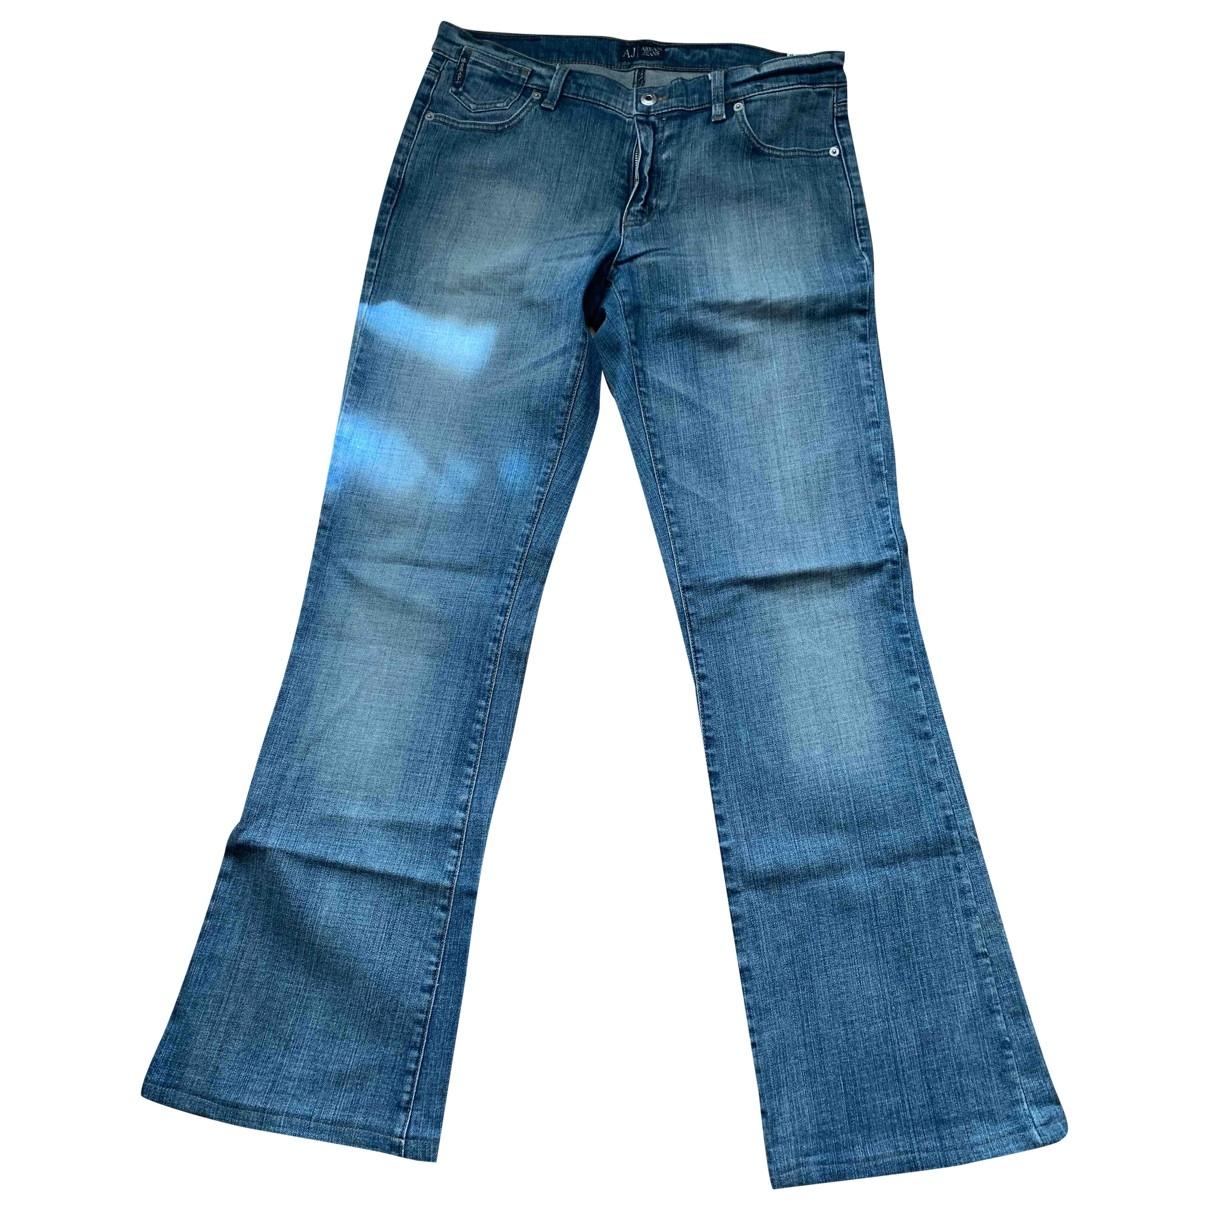 Armani Jeans \N Blue Denim - Jeans Jeans for Women 31 US